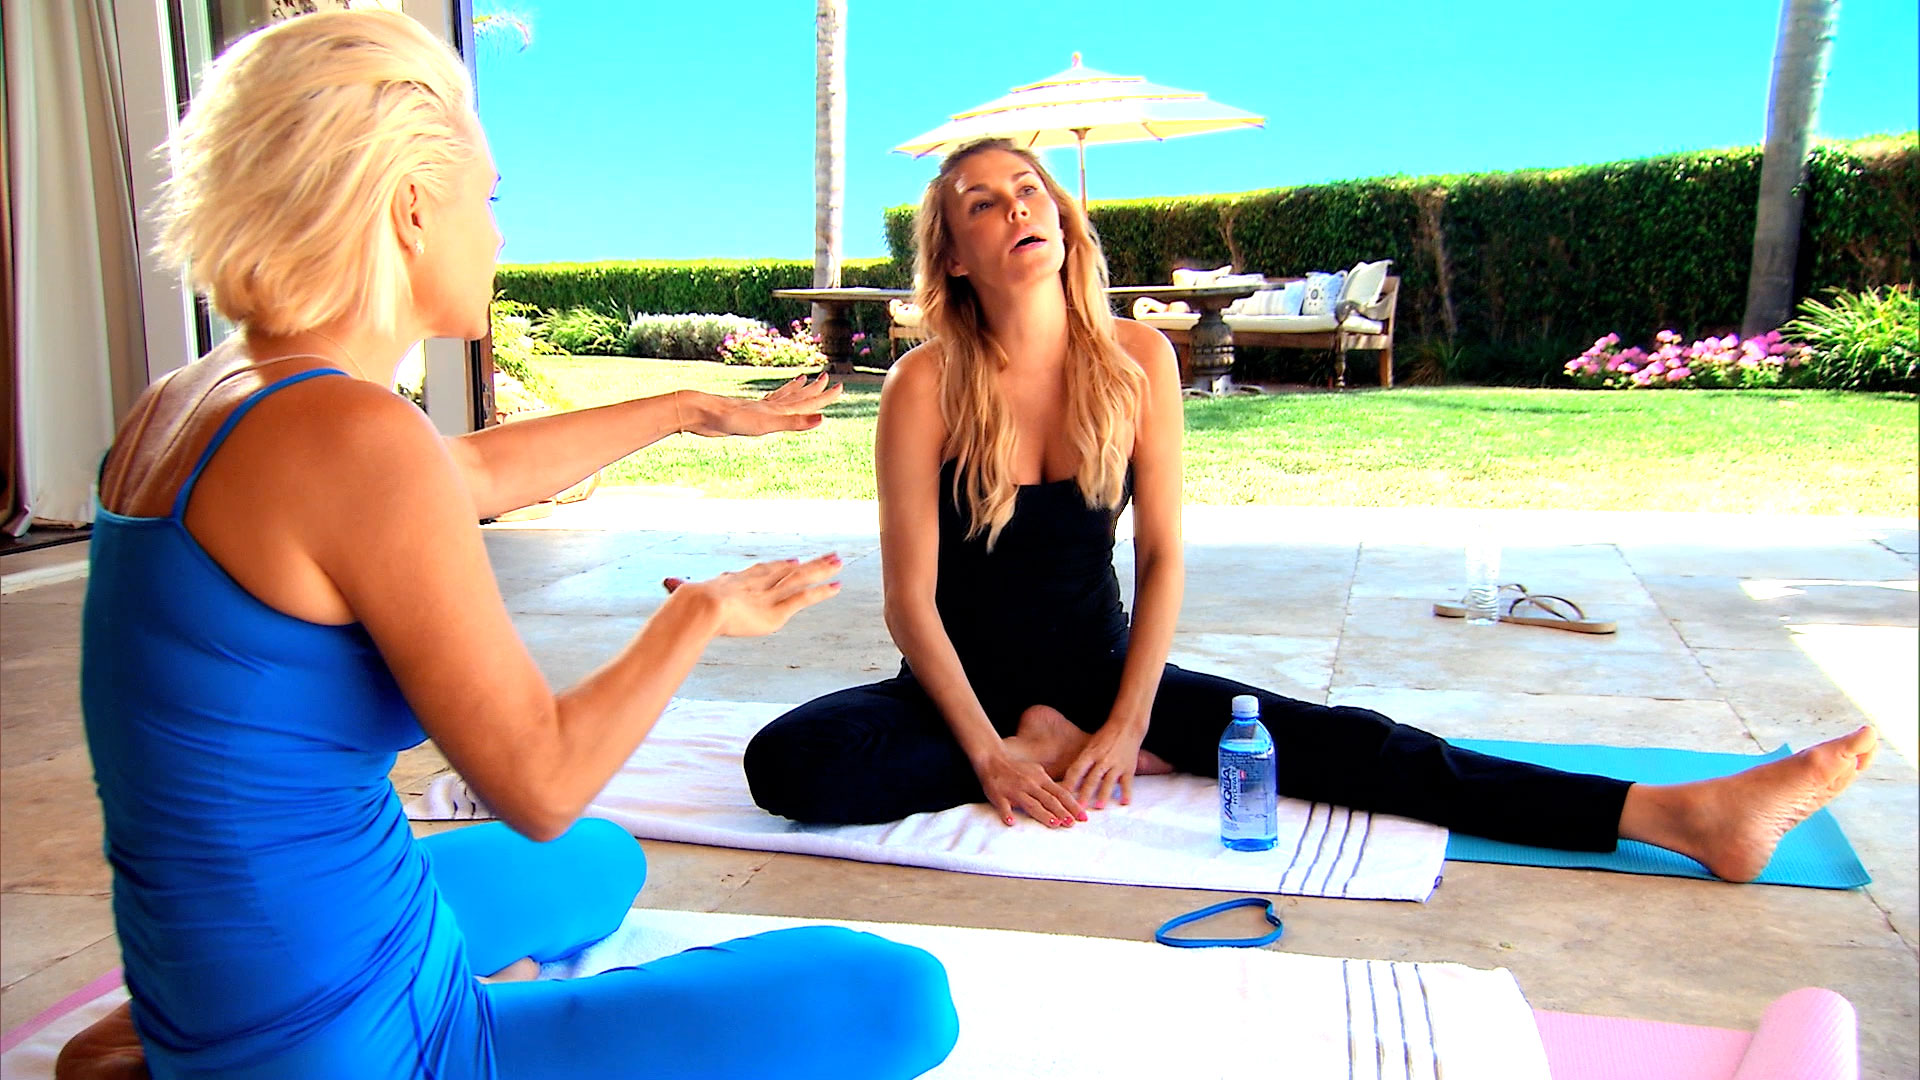 brandi love fitness | Amatfitness.co